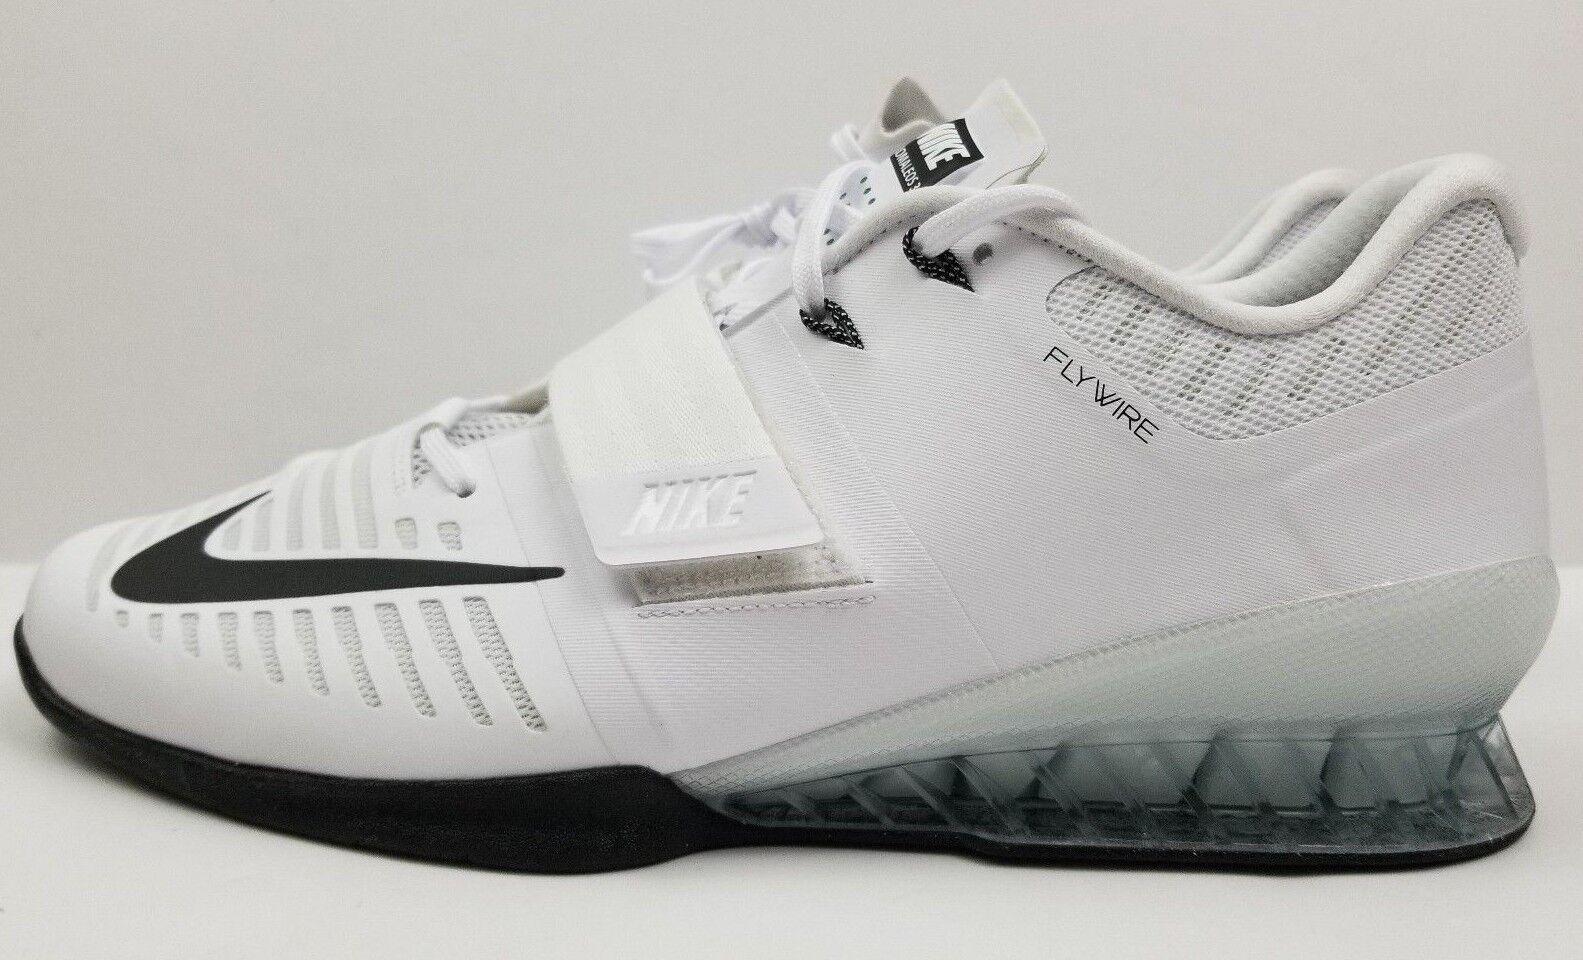 Nike Romaleos 3 Weightlifting Training Shoes White/Black 852933-100 Men's Sz 14